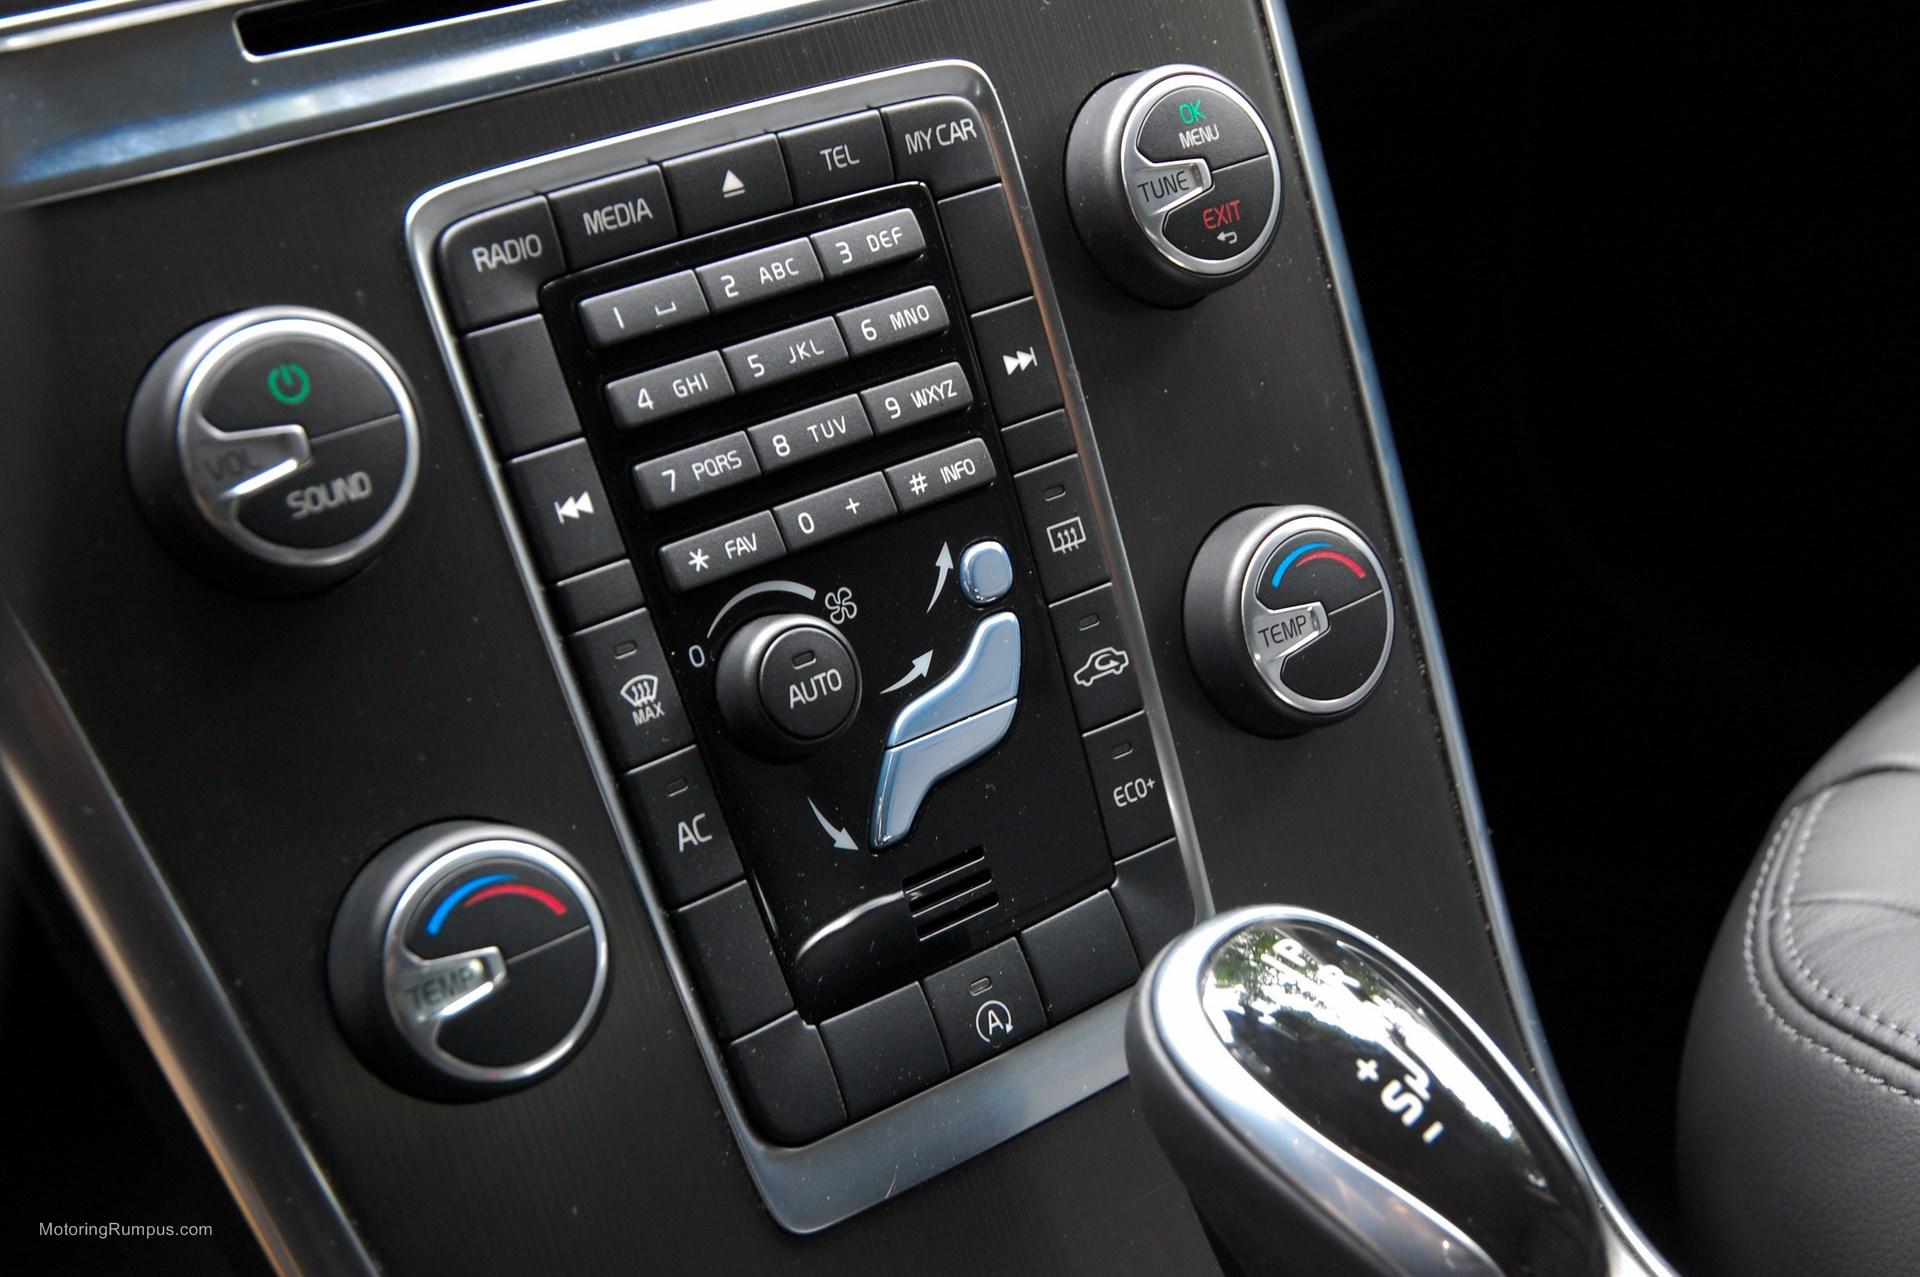 2015 Volvo XC60 Climate Control